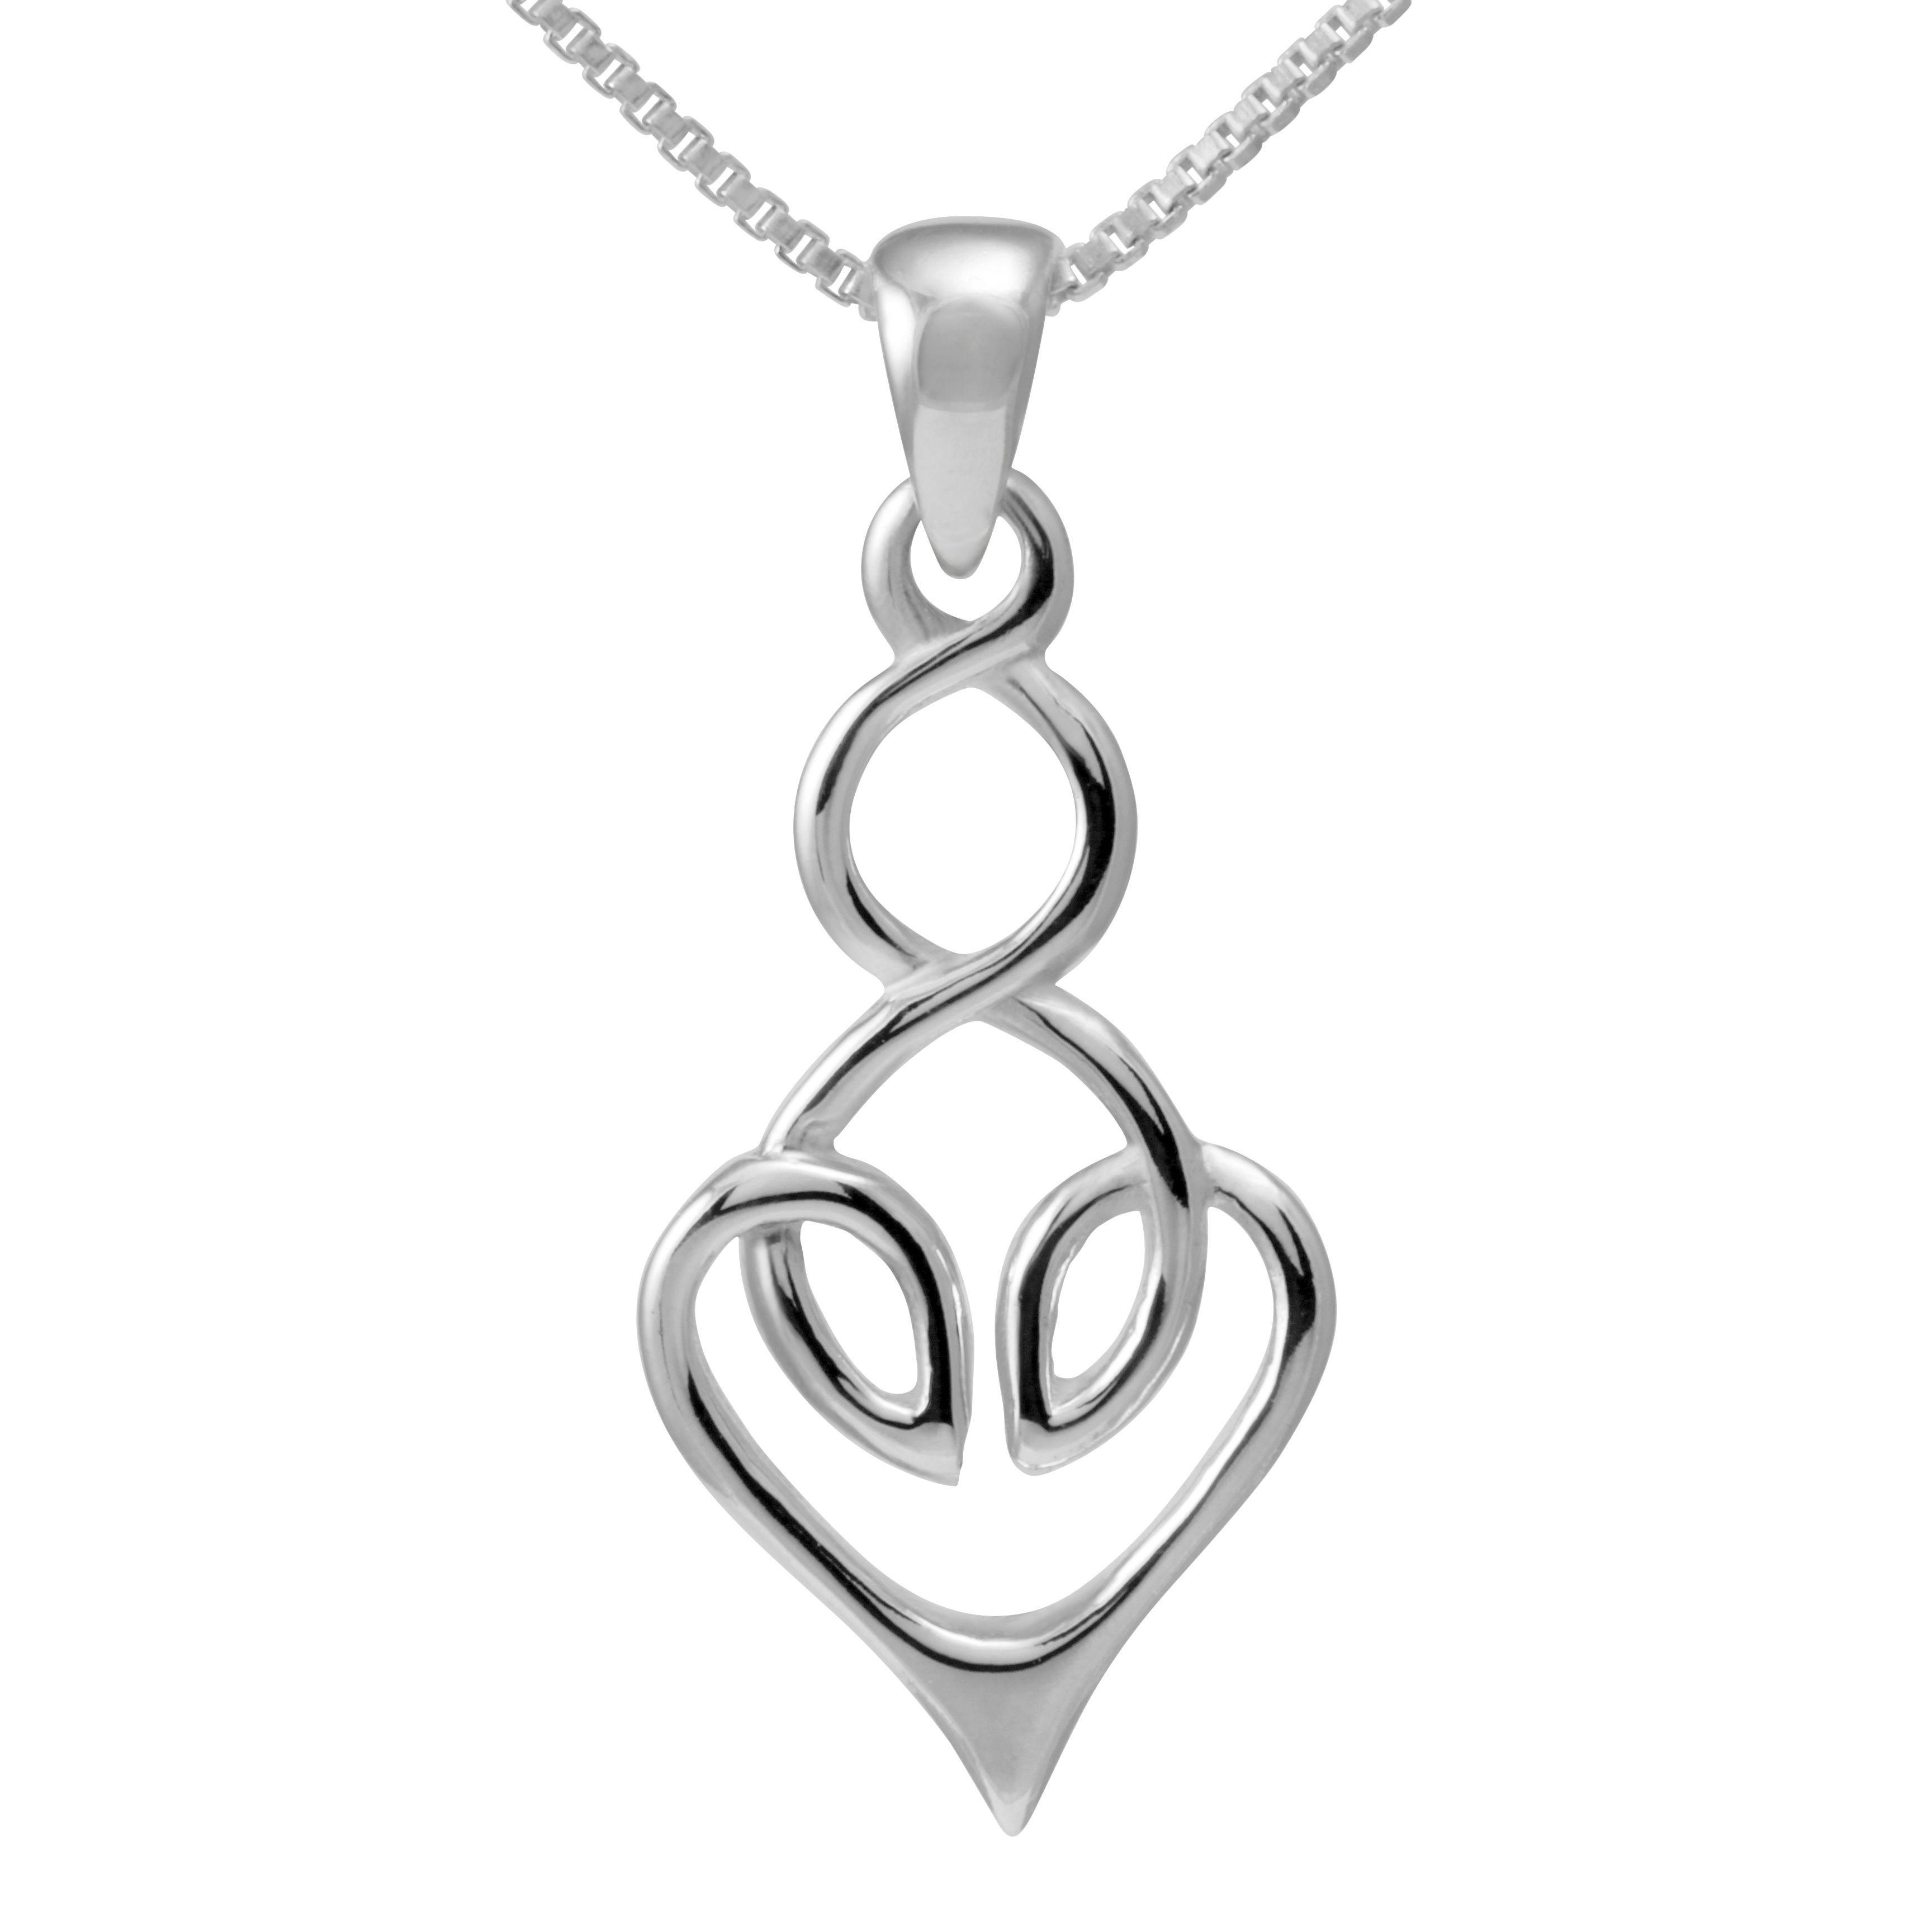 Sterling Celtic Heart Design Necklace | Products | Pinterest ...